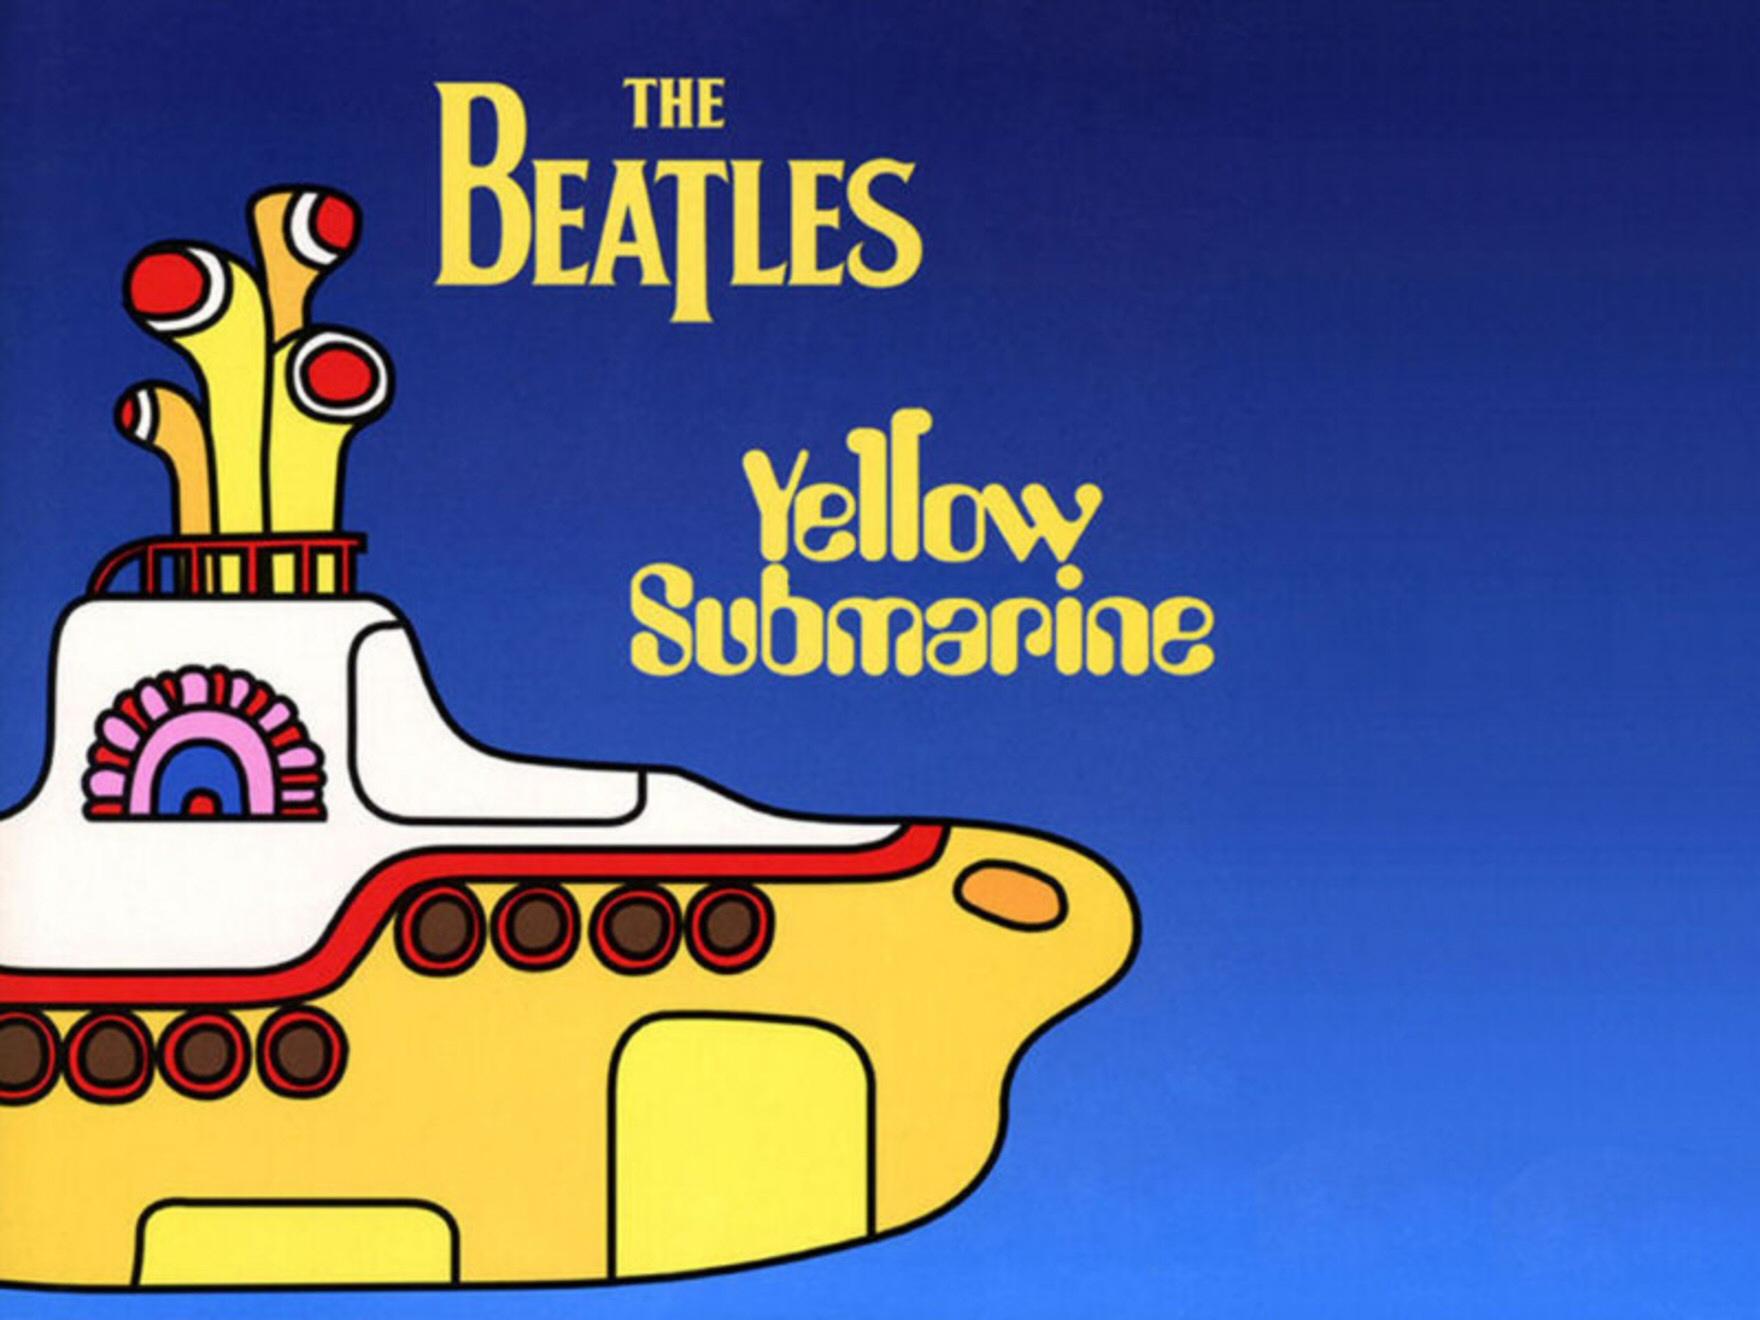 Beatles Yellow Submarine Wallpaper 1760x1320